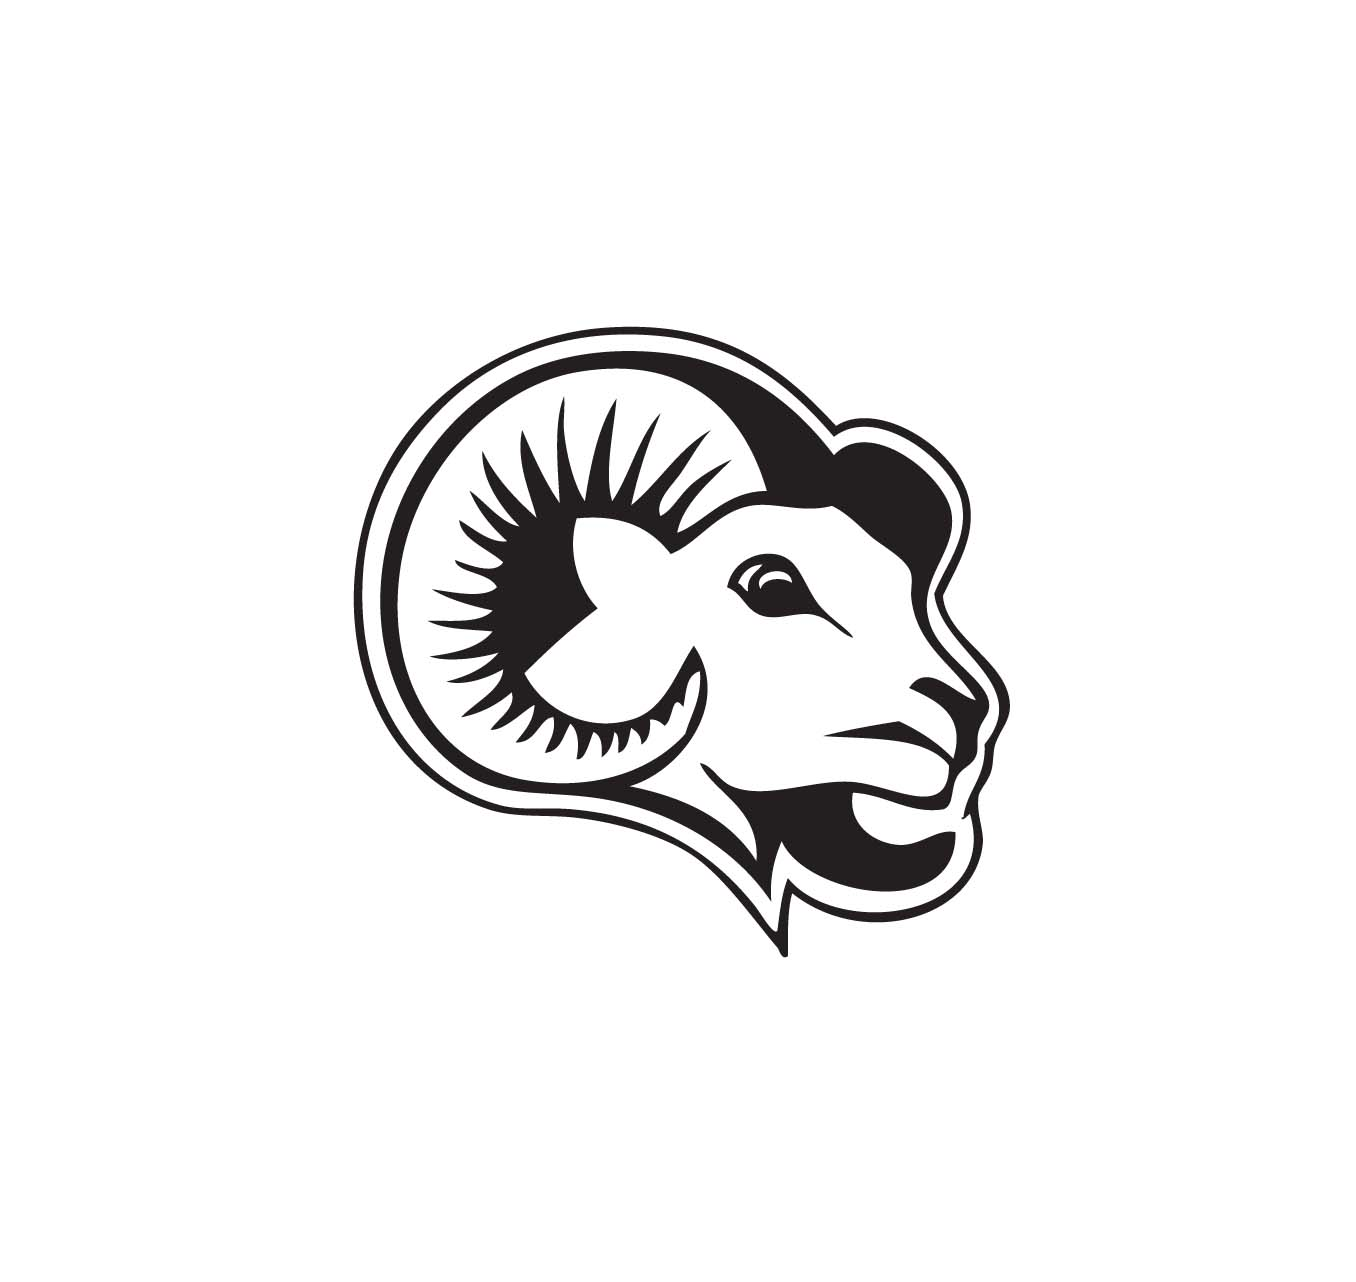 ... head of the ram (ram head